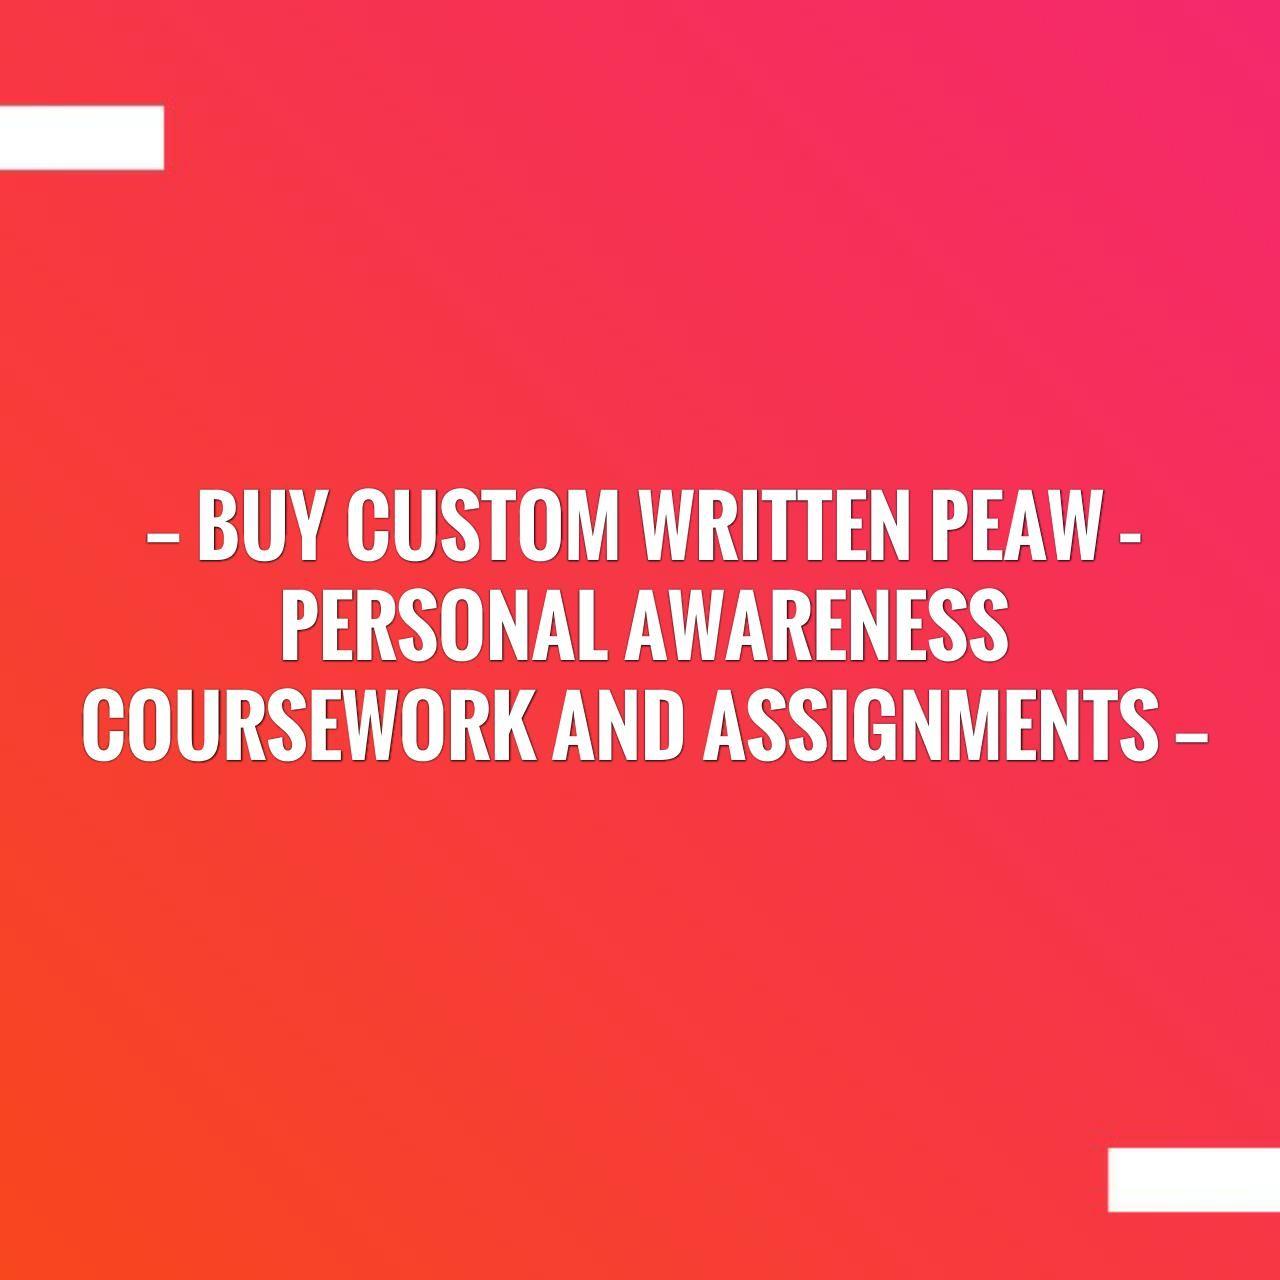 custom written coursework